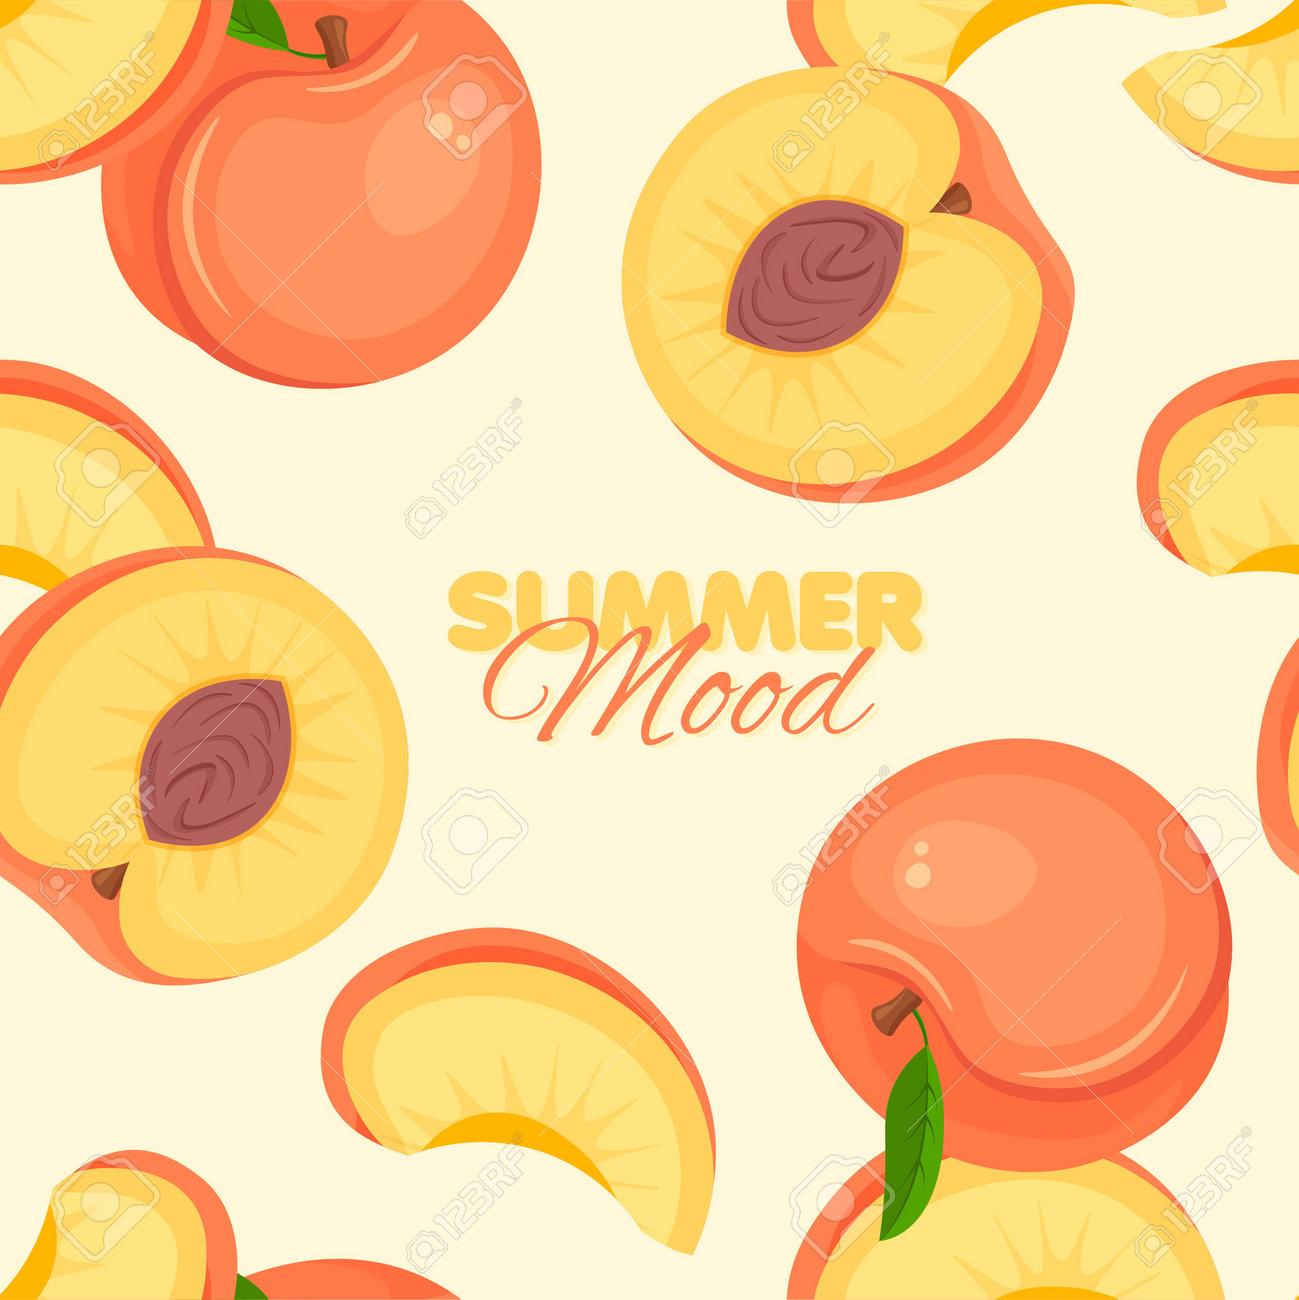 Peach seamless pattern. Summer banner concept. Vector illustration. - 169877774